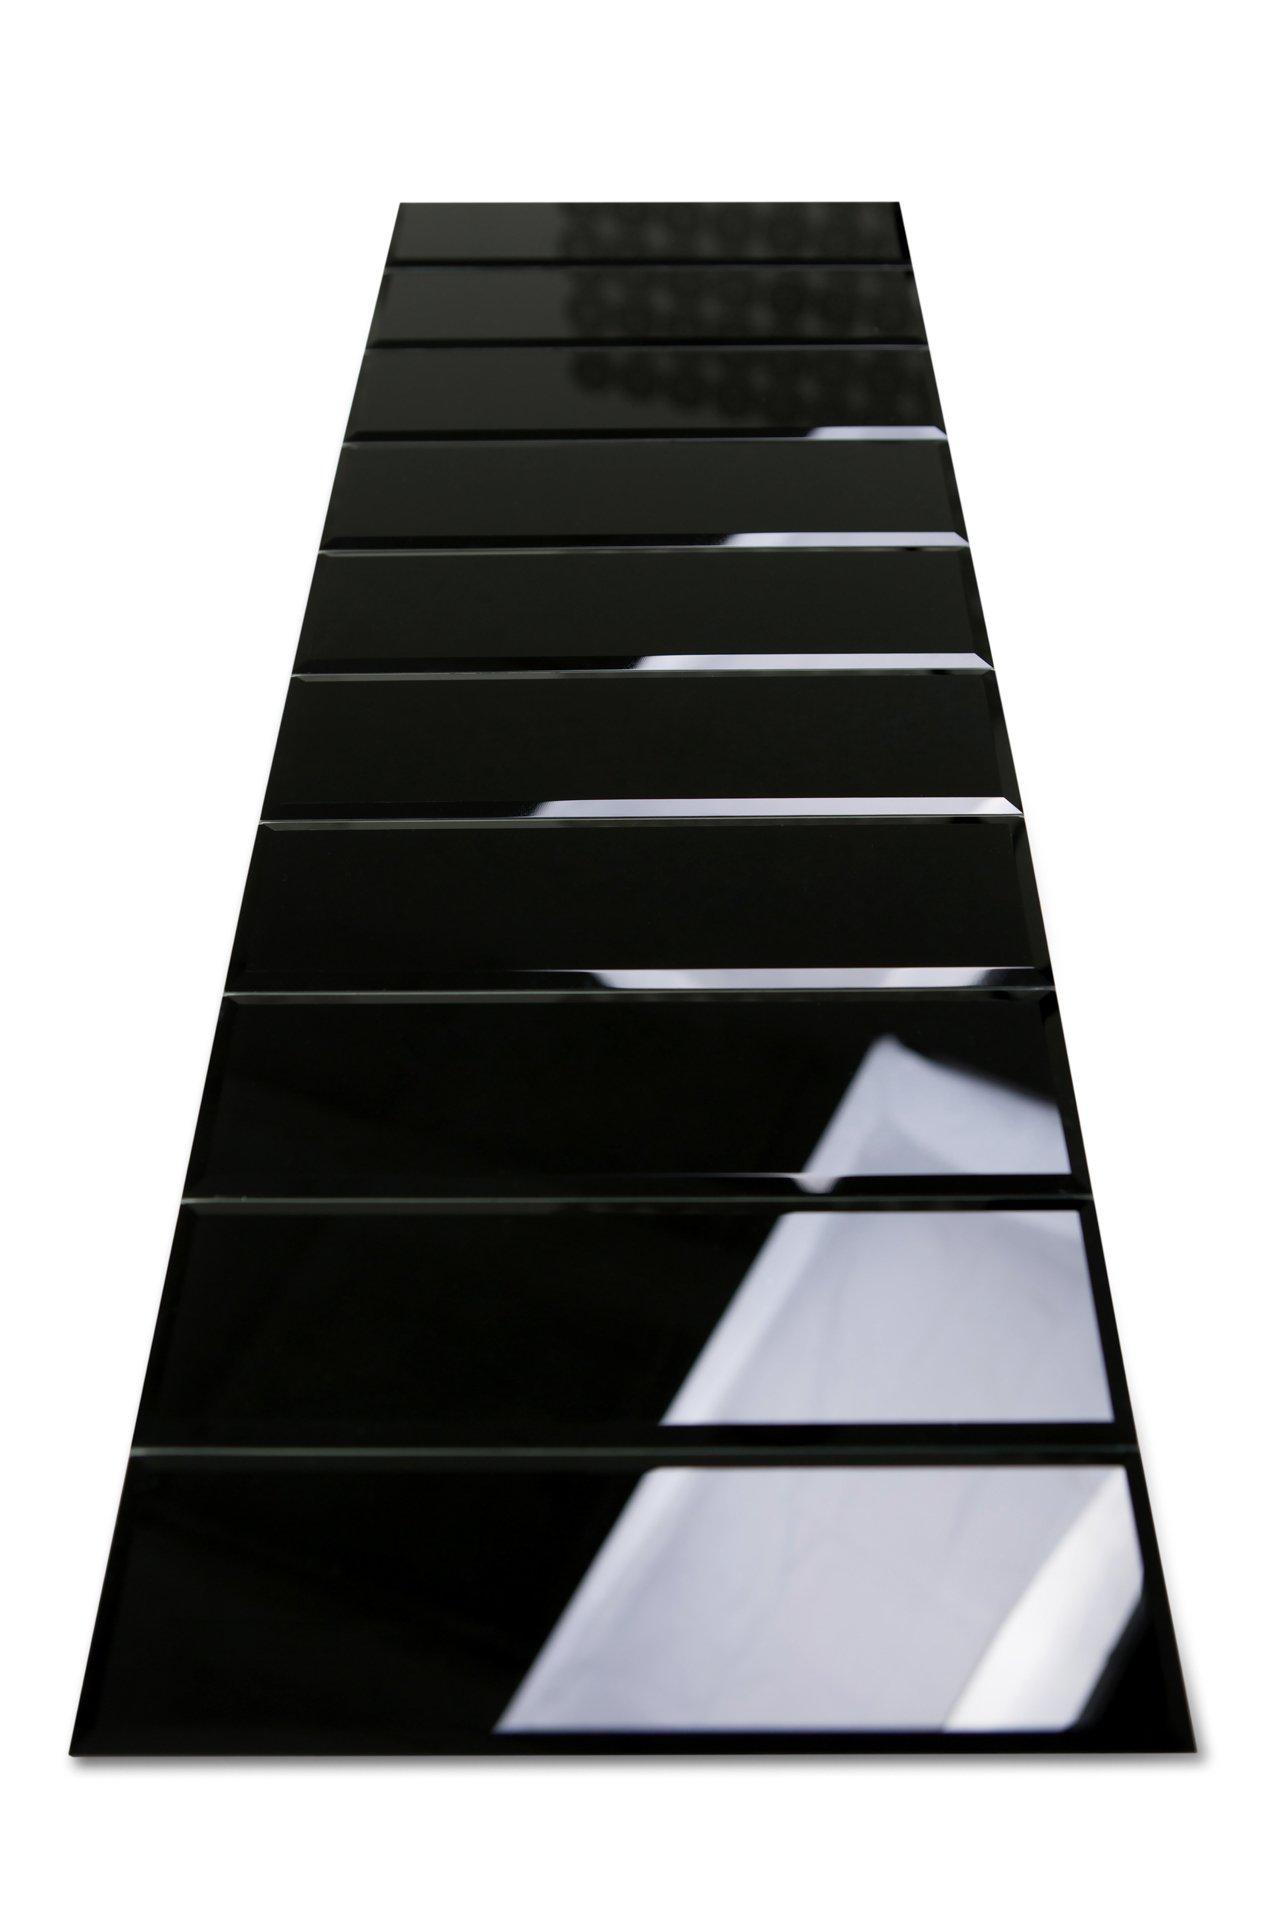 3'' x 10'' Subway/Brick Black Glass Tile with Beveled Edge for Kitchen Backsplash/Bathroom 55 Tiles Kit/Covers 12sq/ft